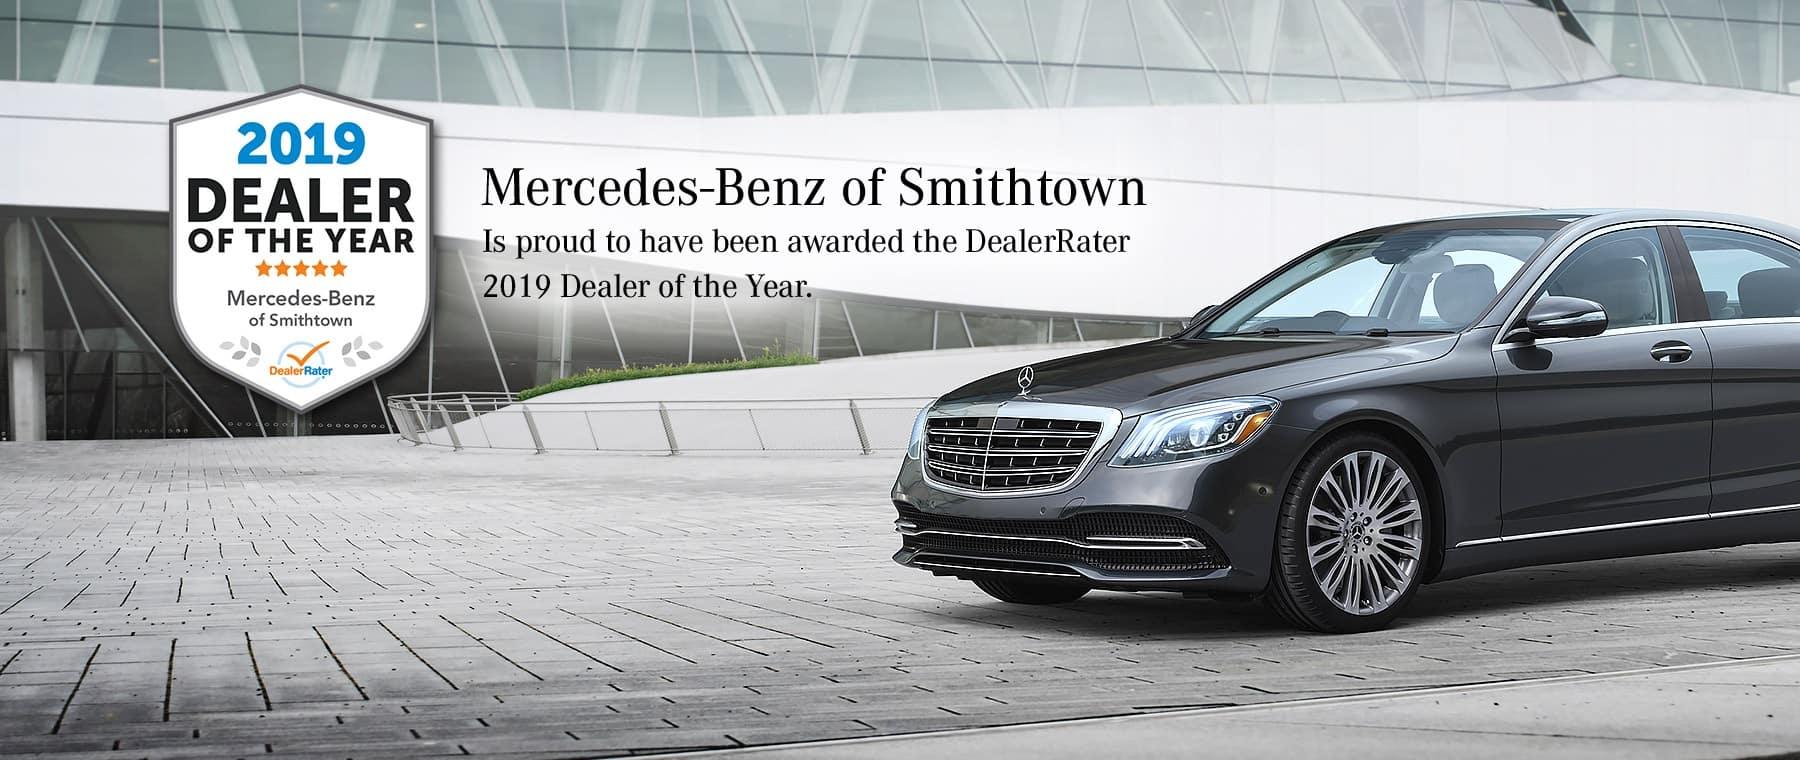 Mercedes Benz Of Smithtown Mercedes Benz Dealer In St James Ny